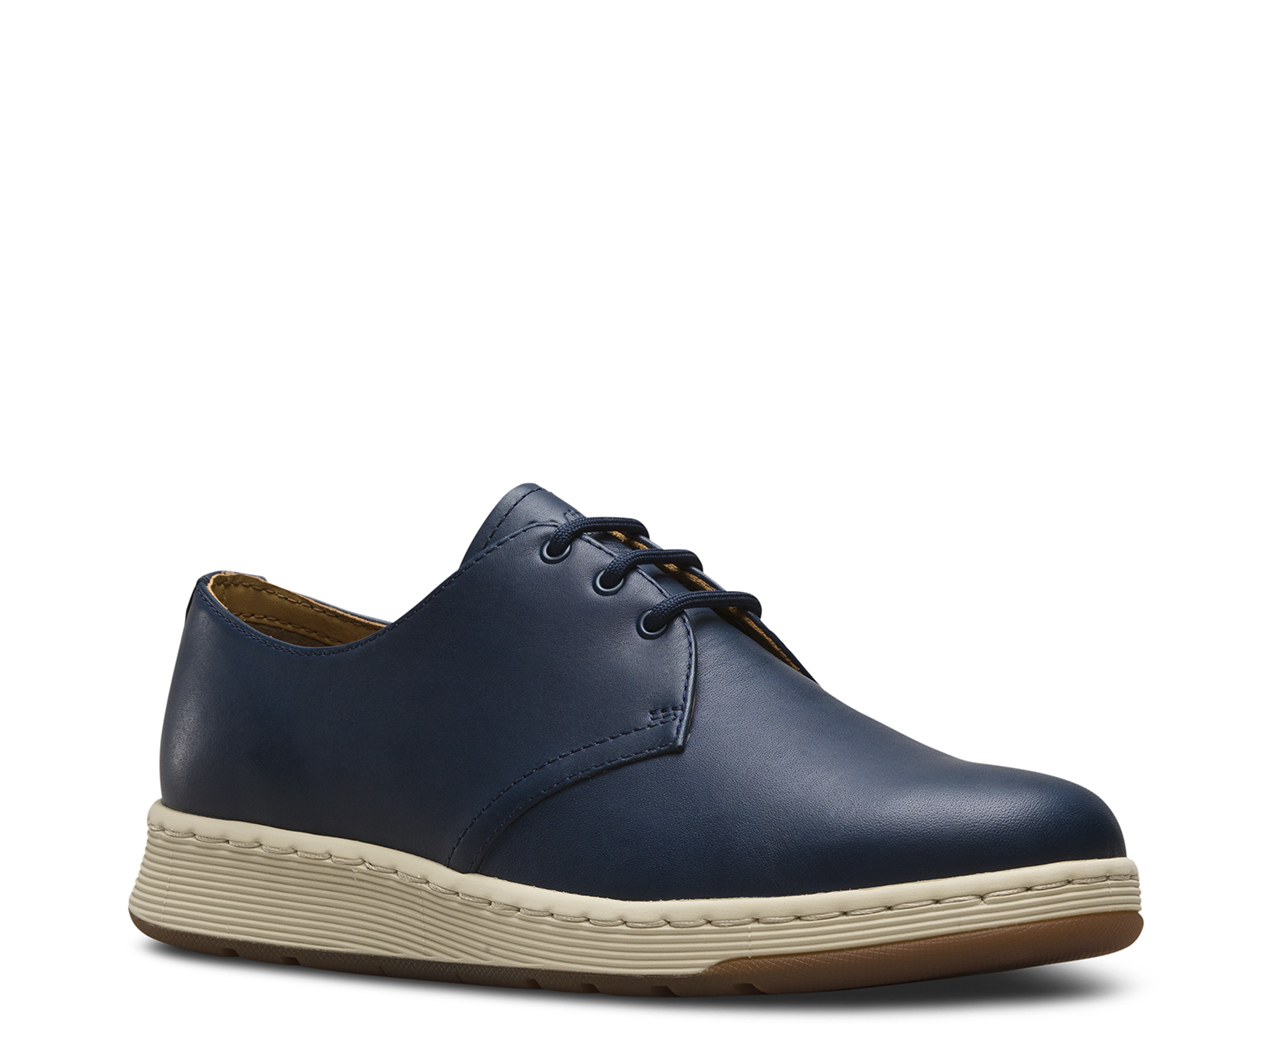 Dr.Martens Mens Cavendish 3-Eyelet Black Leather Shoes 46 EU ZpvGz9OQ